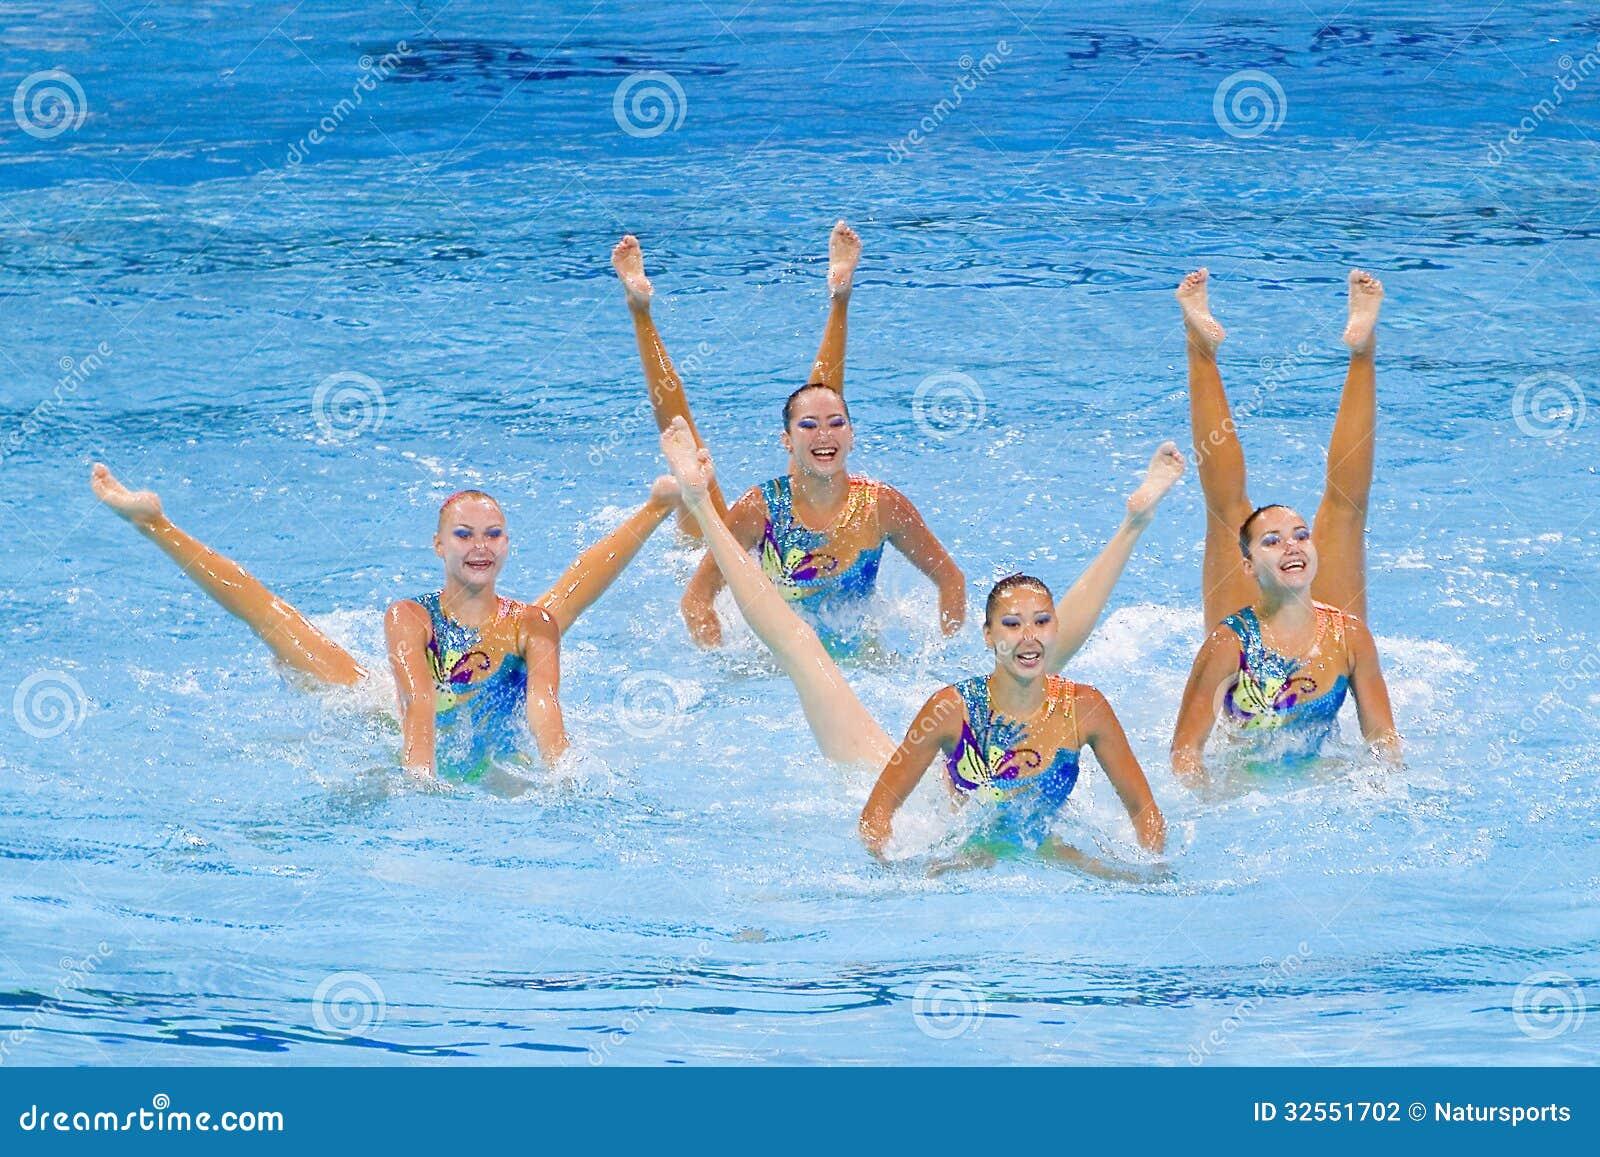 Synchronized swimming - Kazakhstan